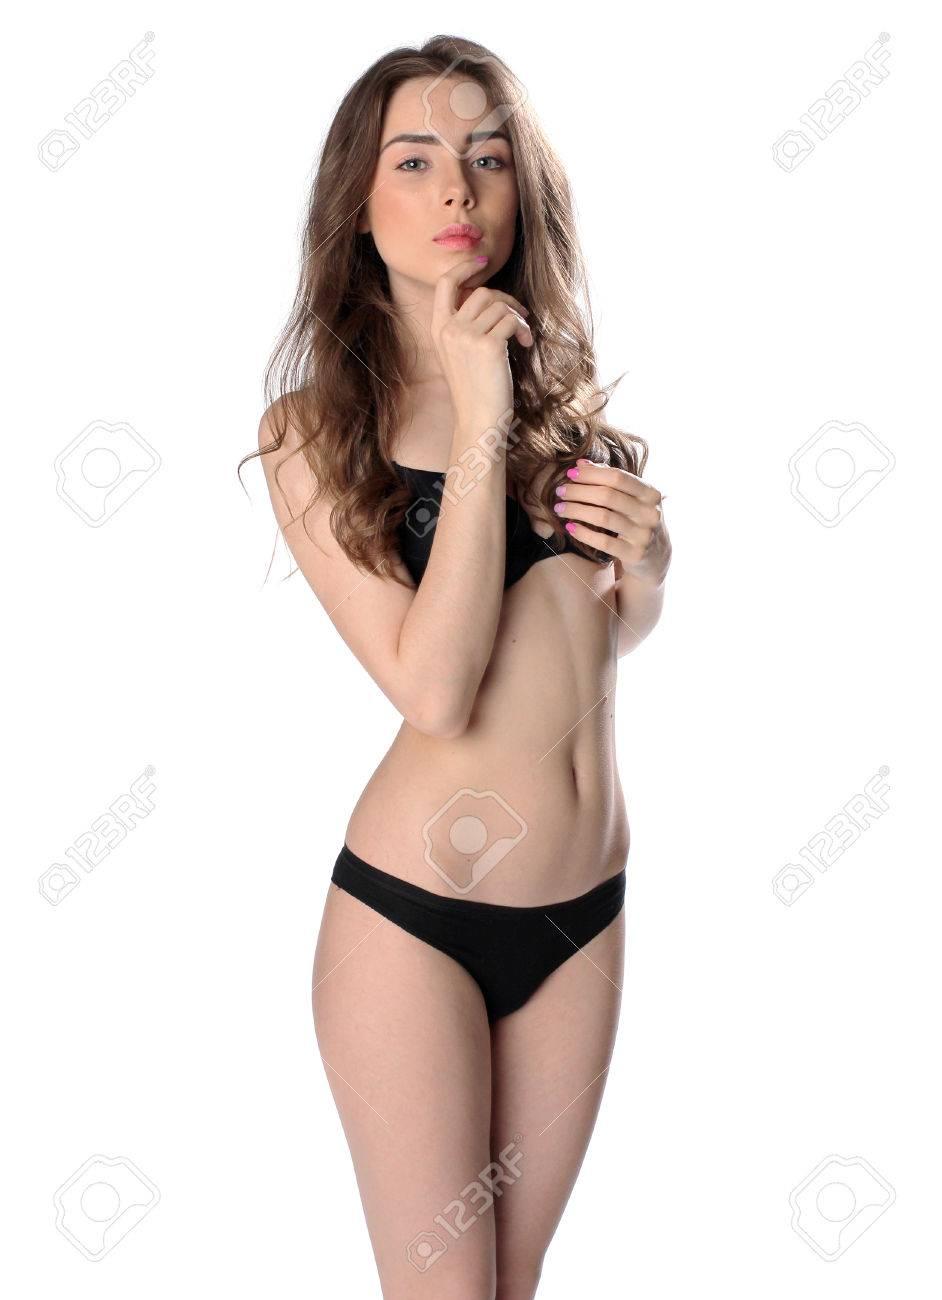 6da6b3a8d Foto de archivo - Hermosa mujer morena en bikini negro aislado en fondo  blanco